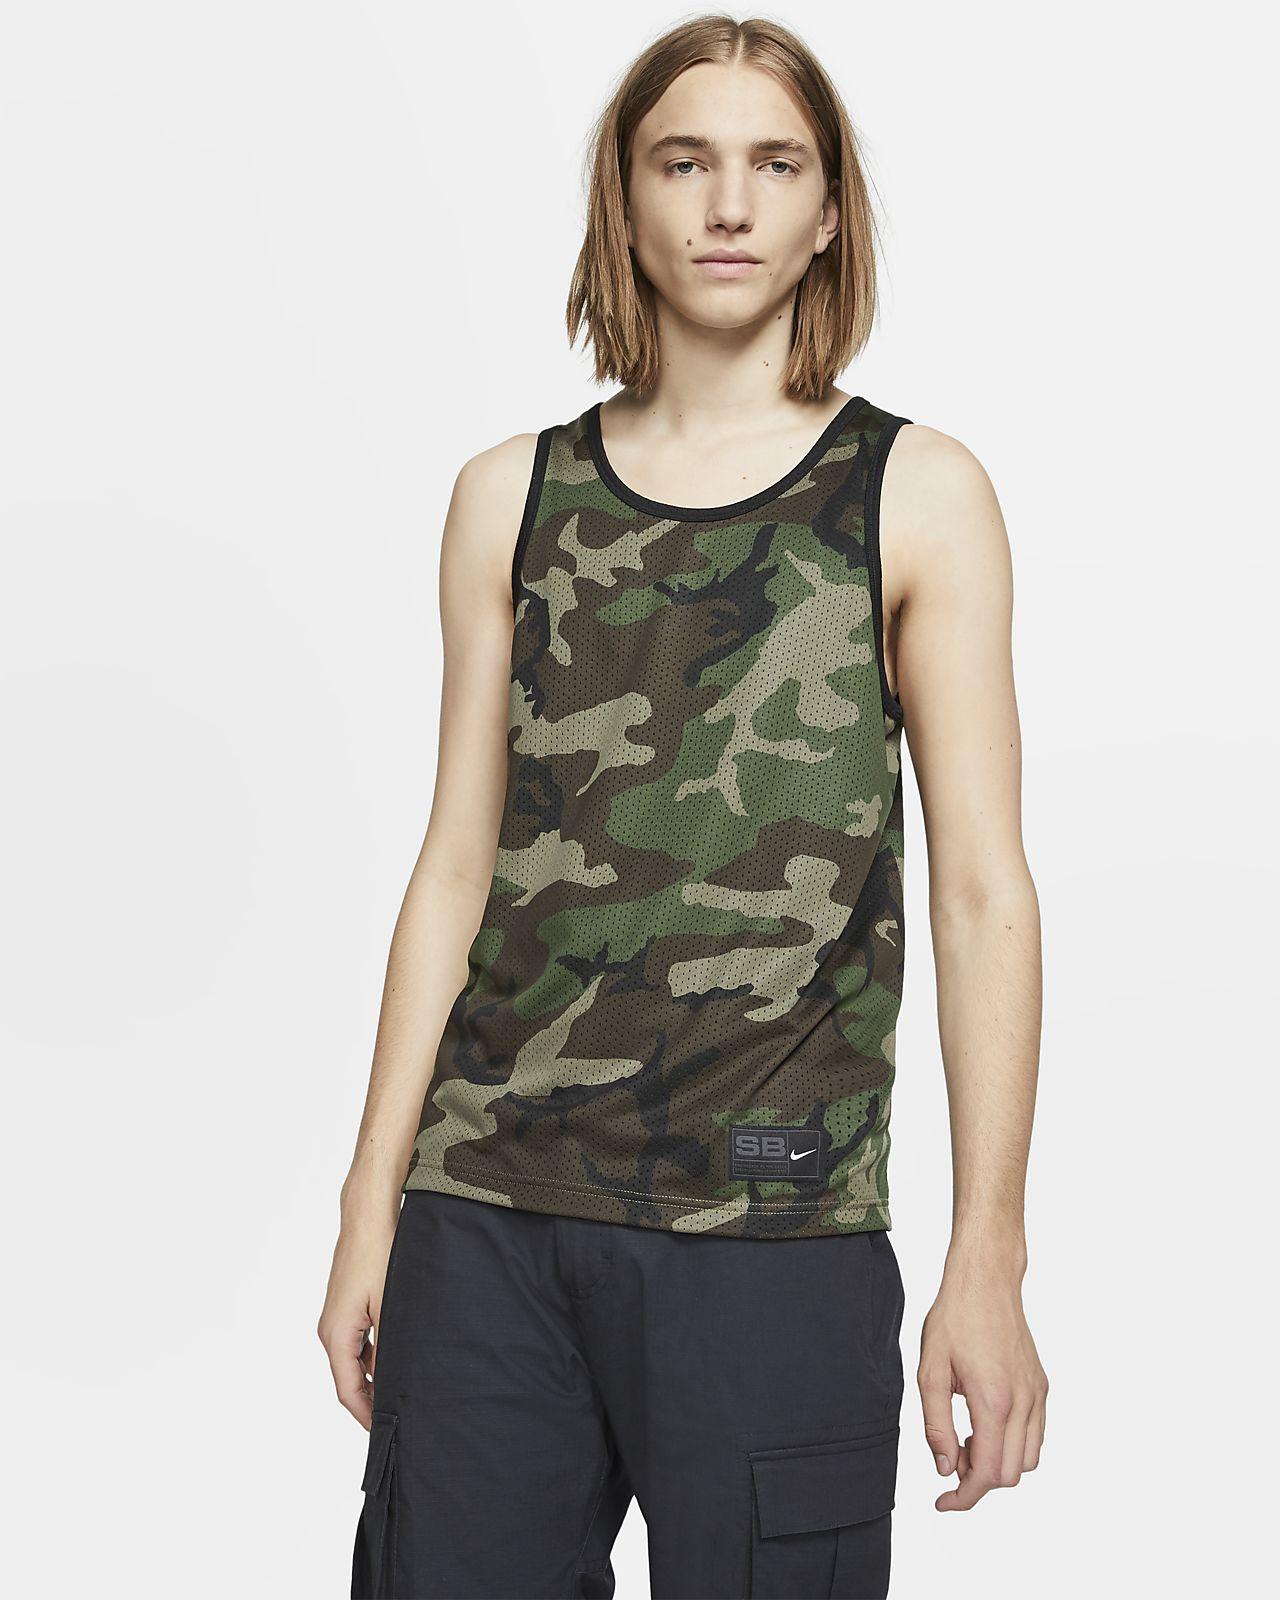 reputable site 2fafa eedc4 Men s Mesh Skate Tank. Nike SB Dri-FIT